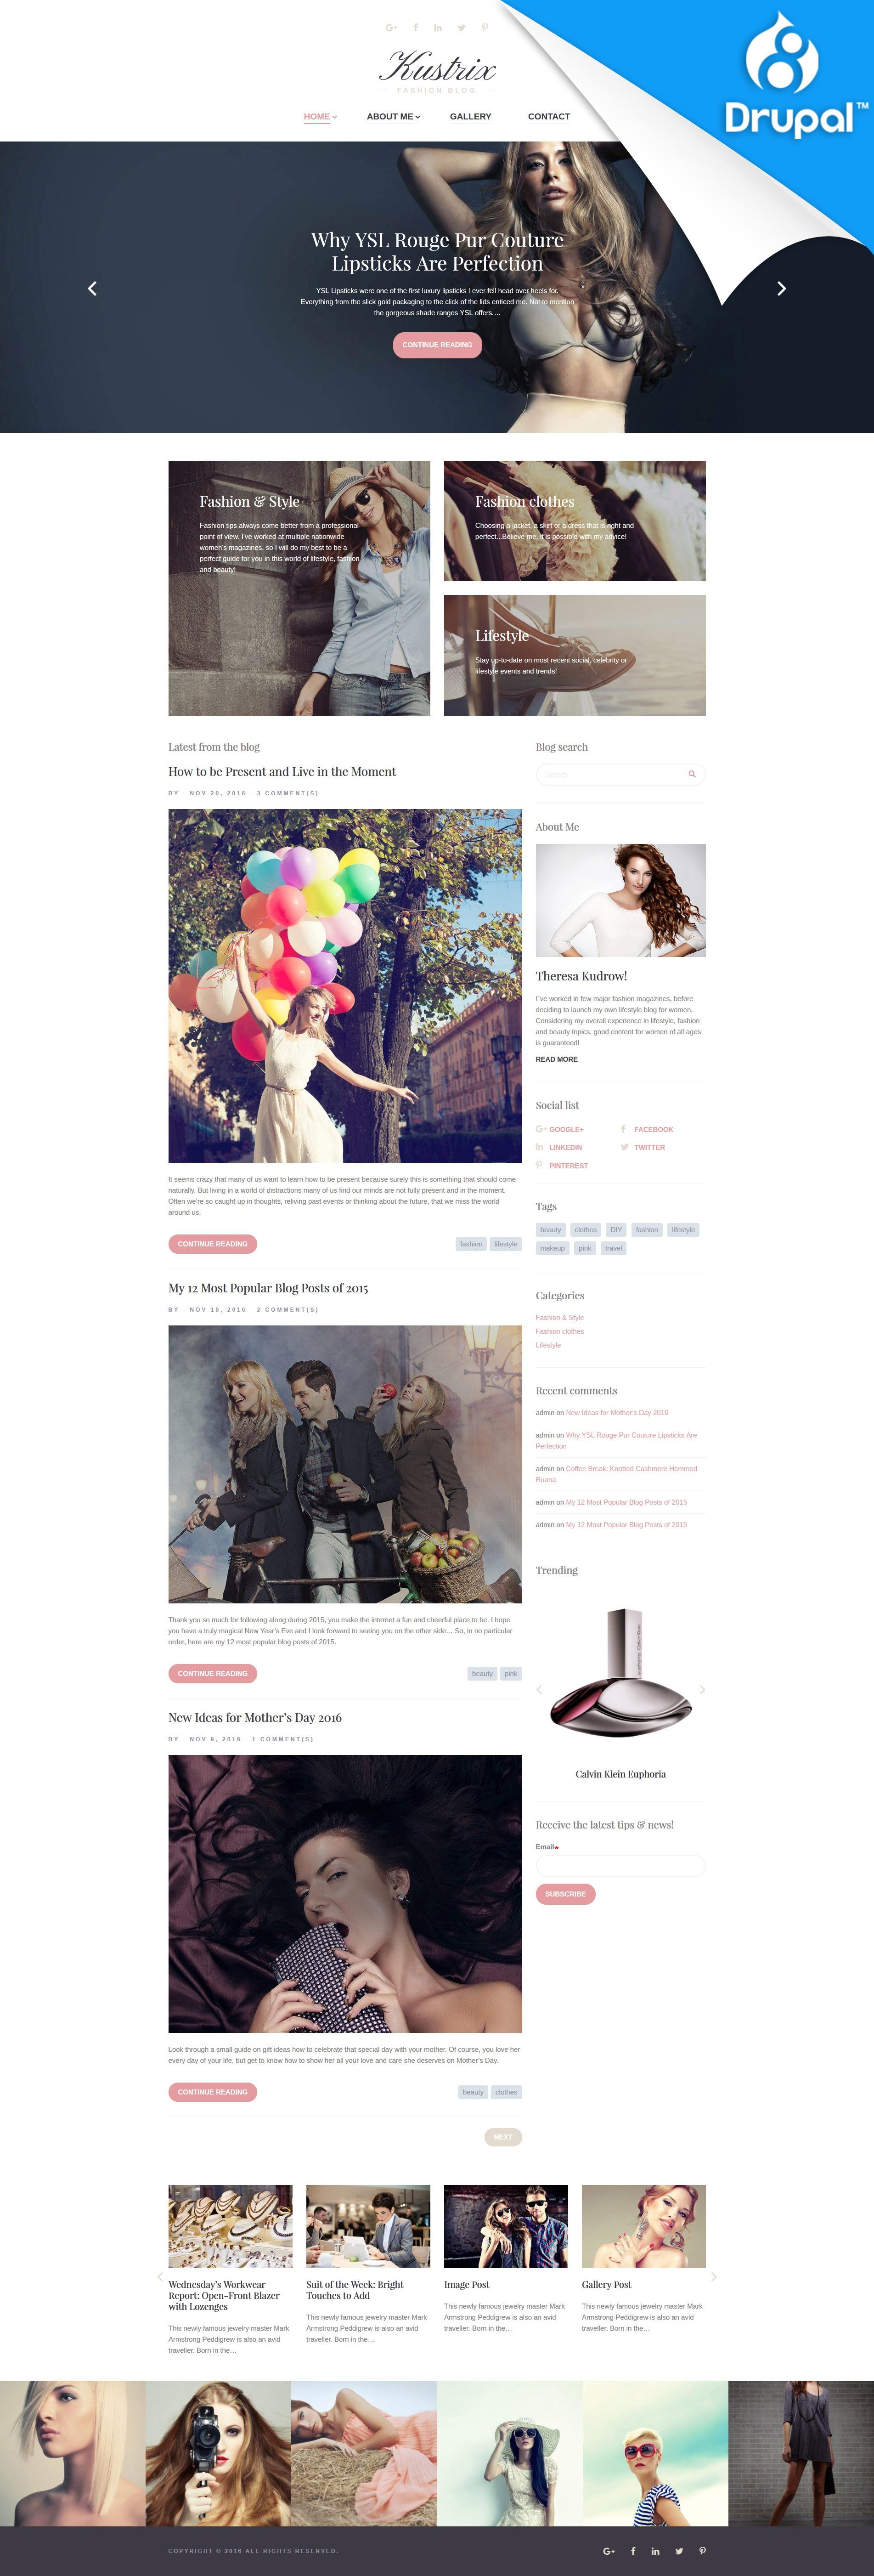 Responsivt Kustrix - Fashion & Lifestyle Blog Drupal-mall #59573